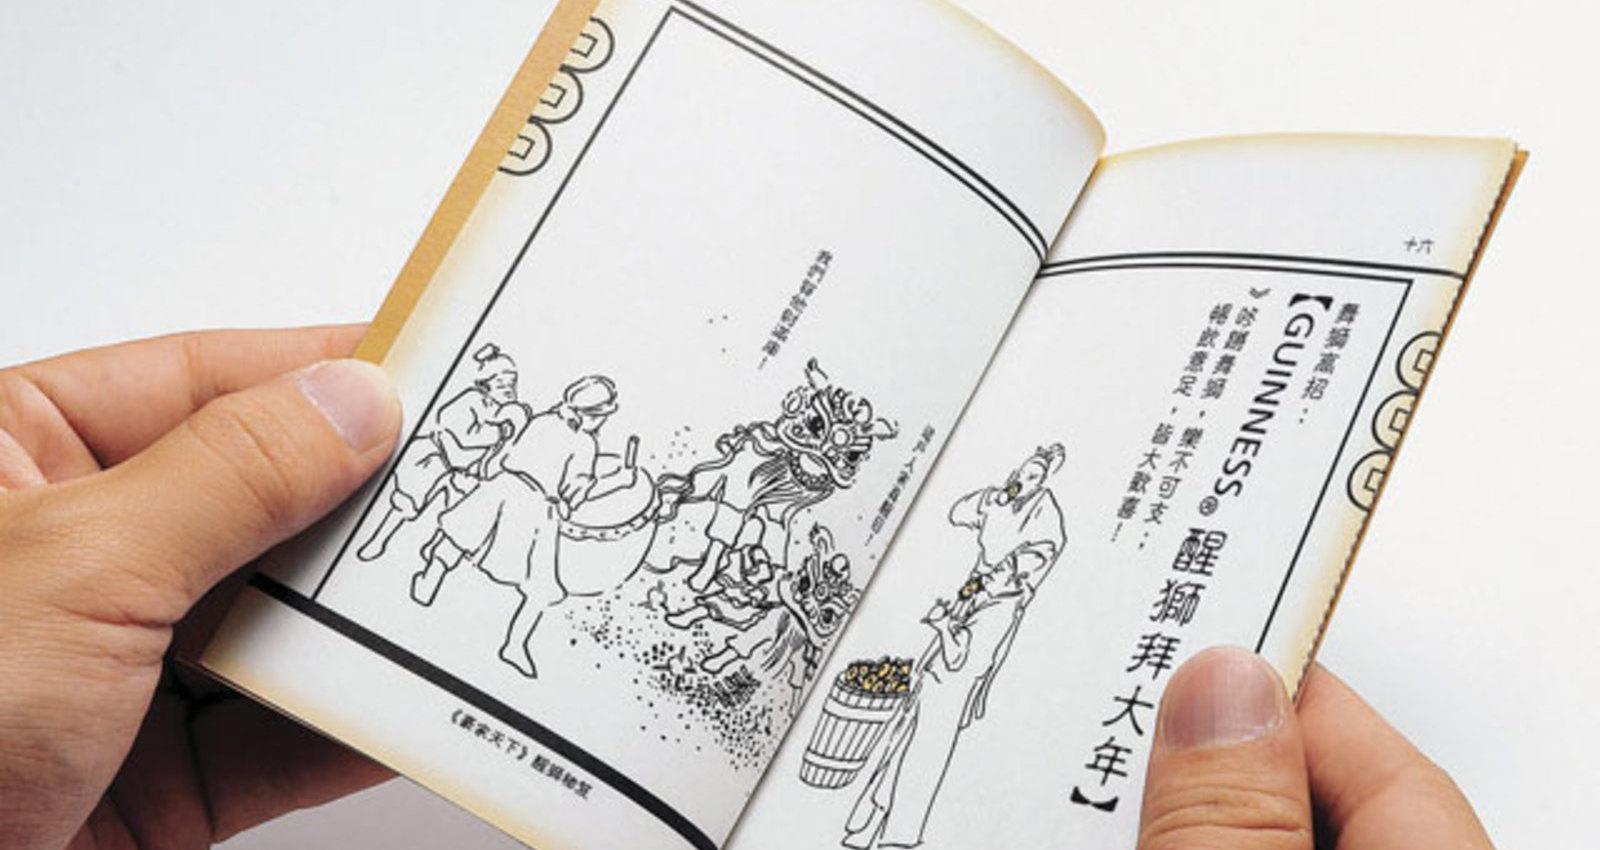 Guinness Lion Dance Manual